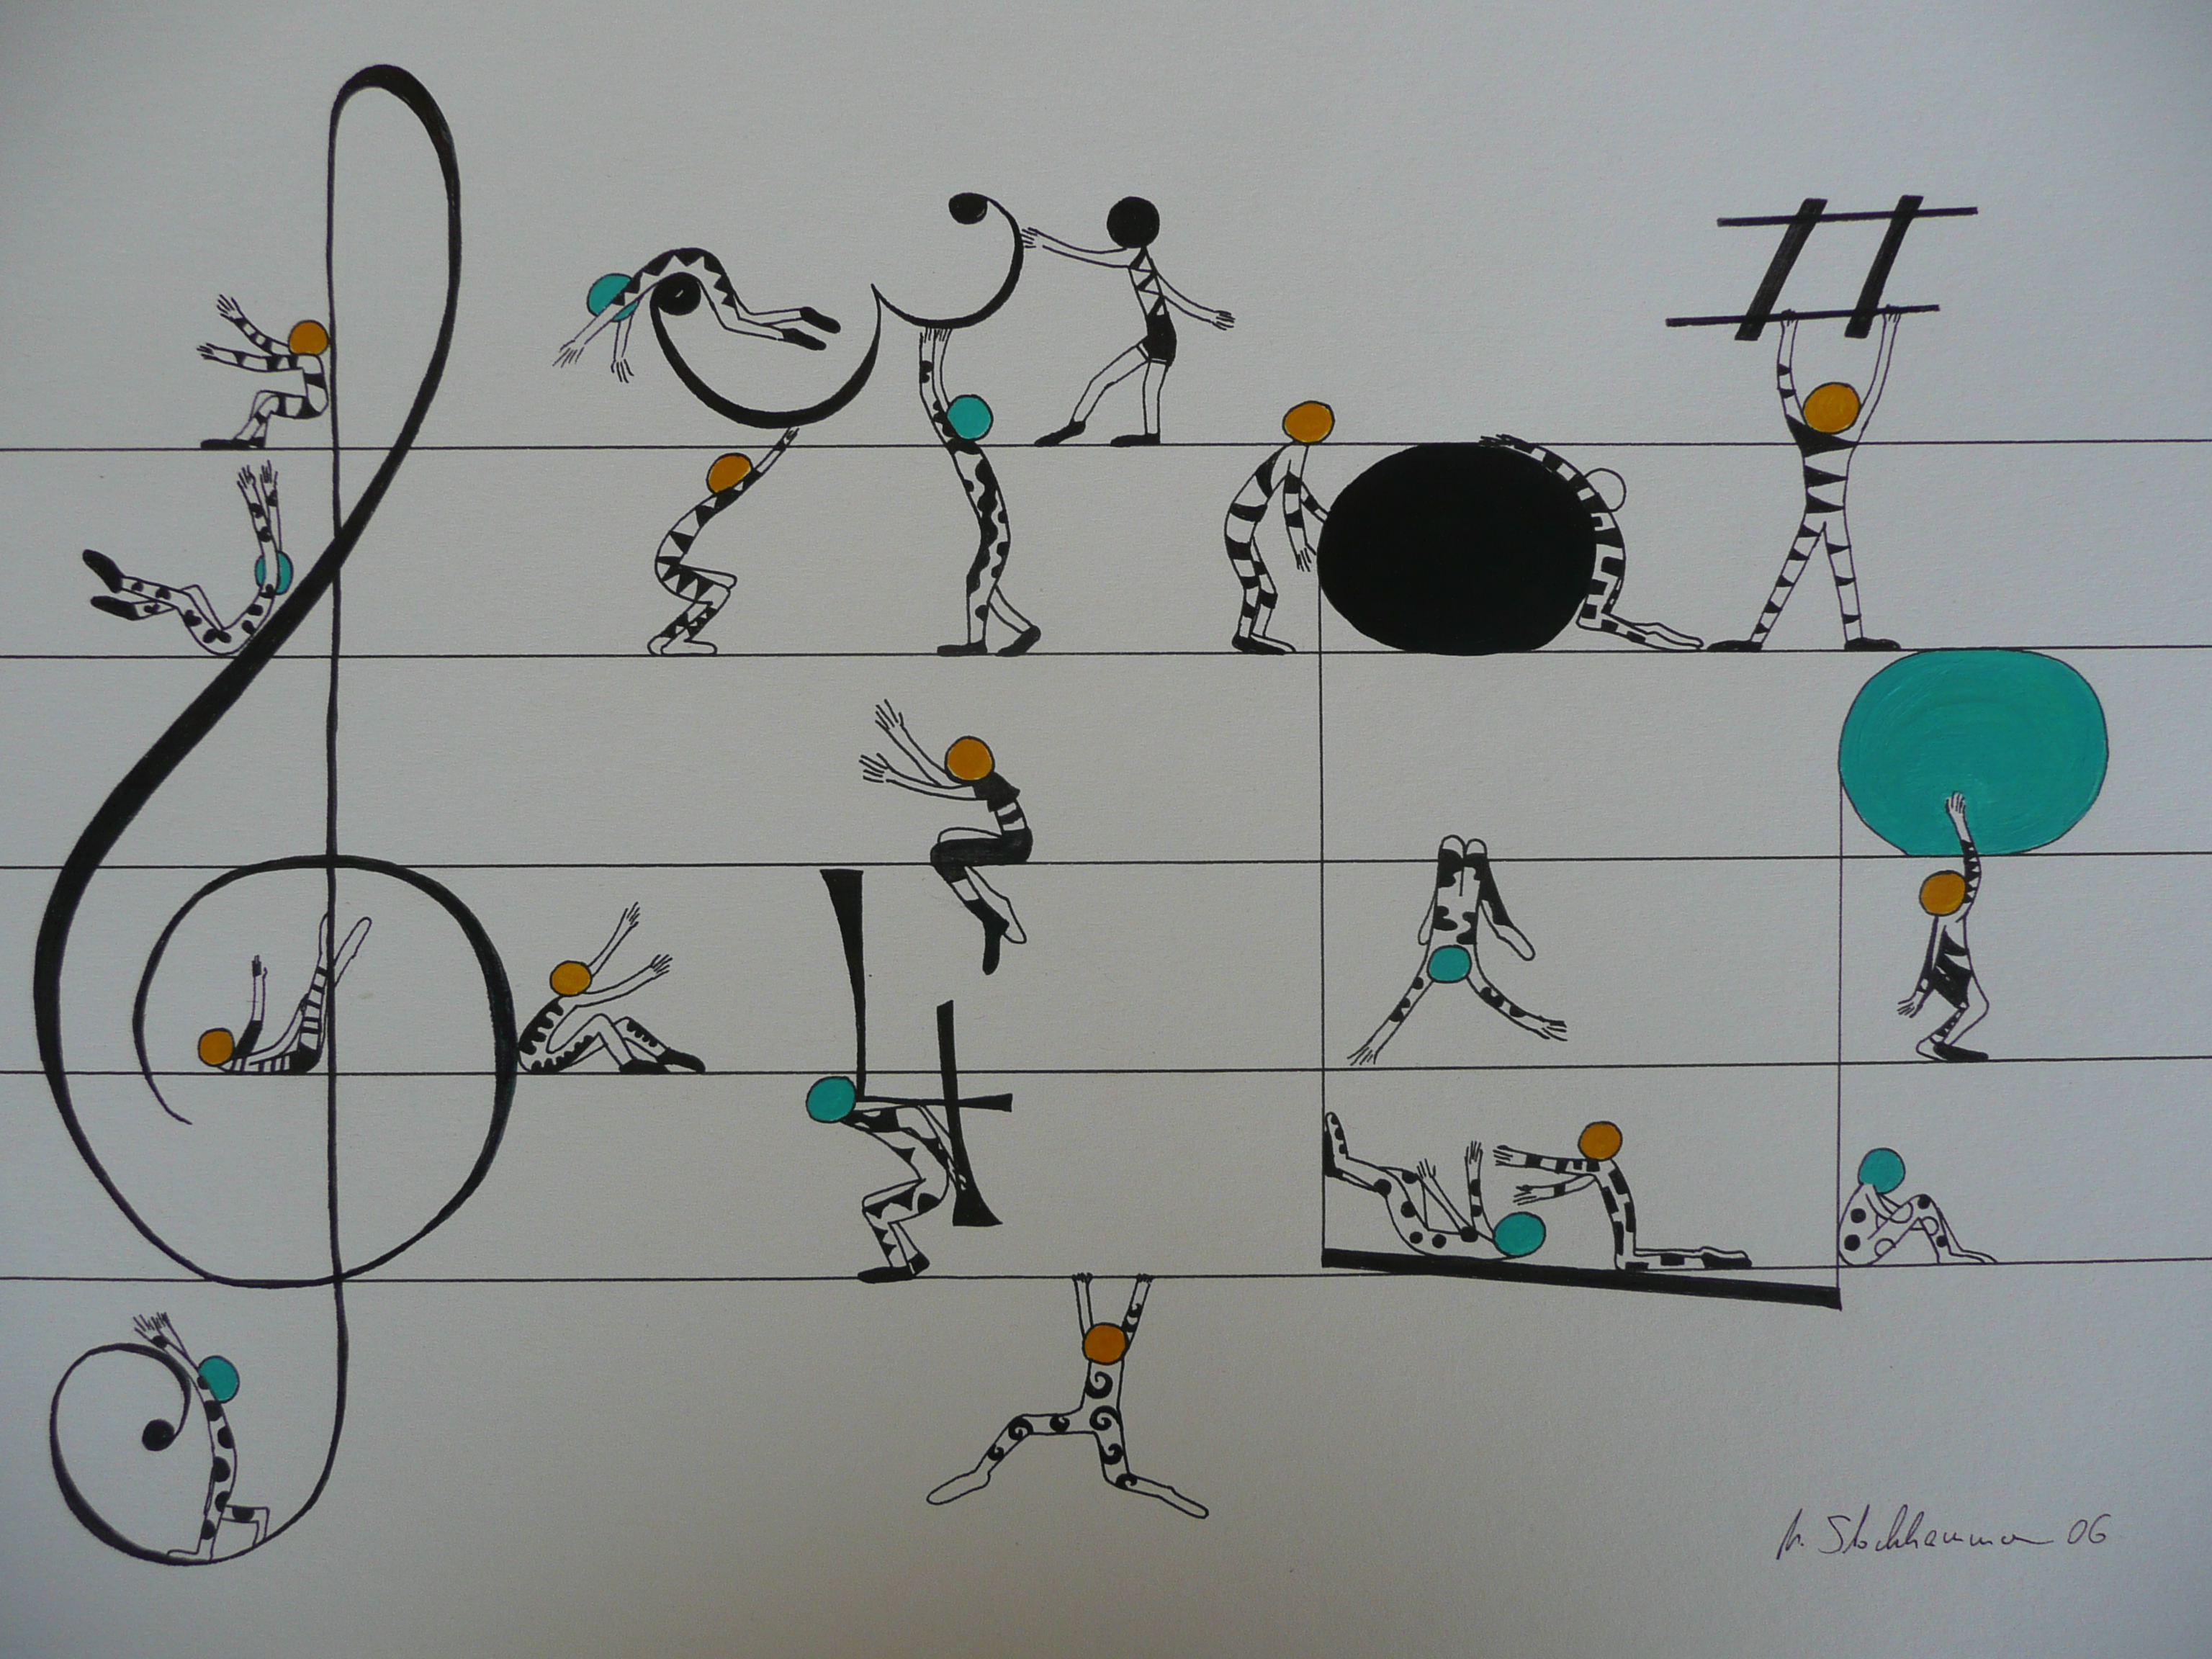 Michaela Stockhammer. Tinte, Acryl. 30x 40 cm | Art On Screen - [AOS] Magazine